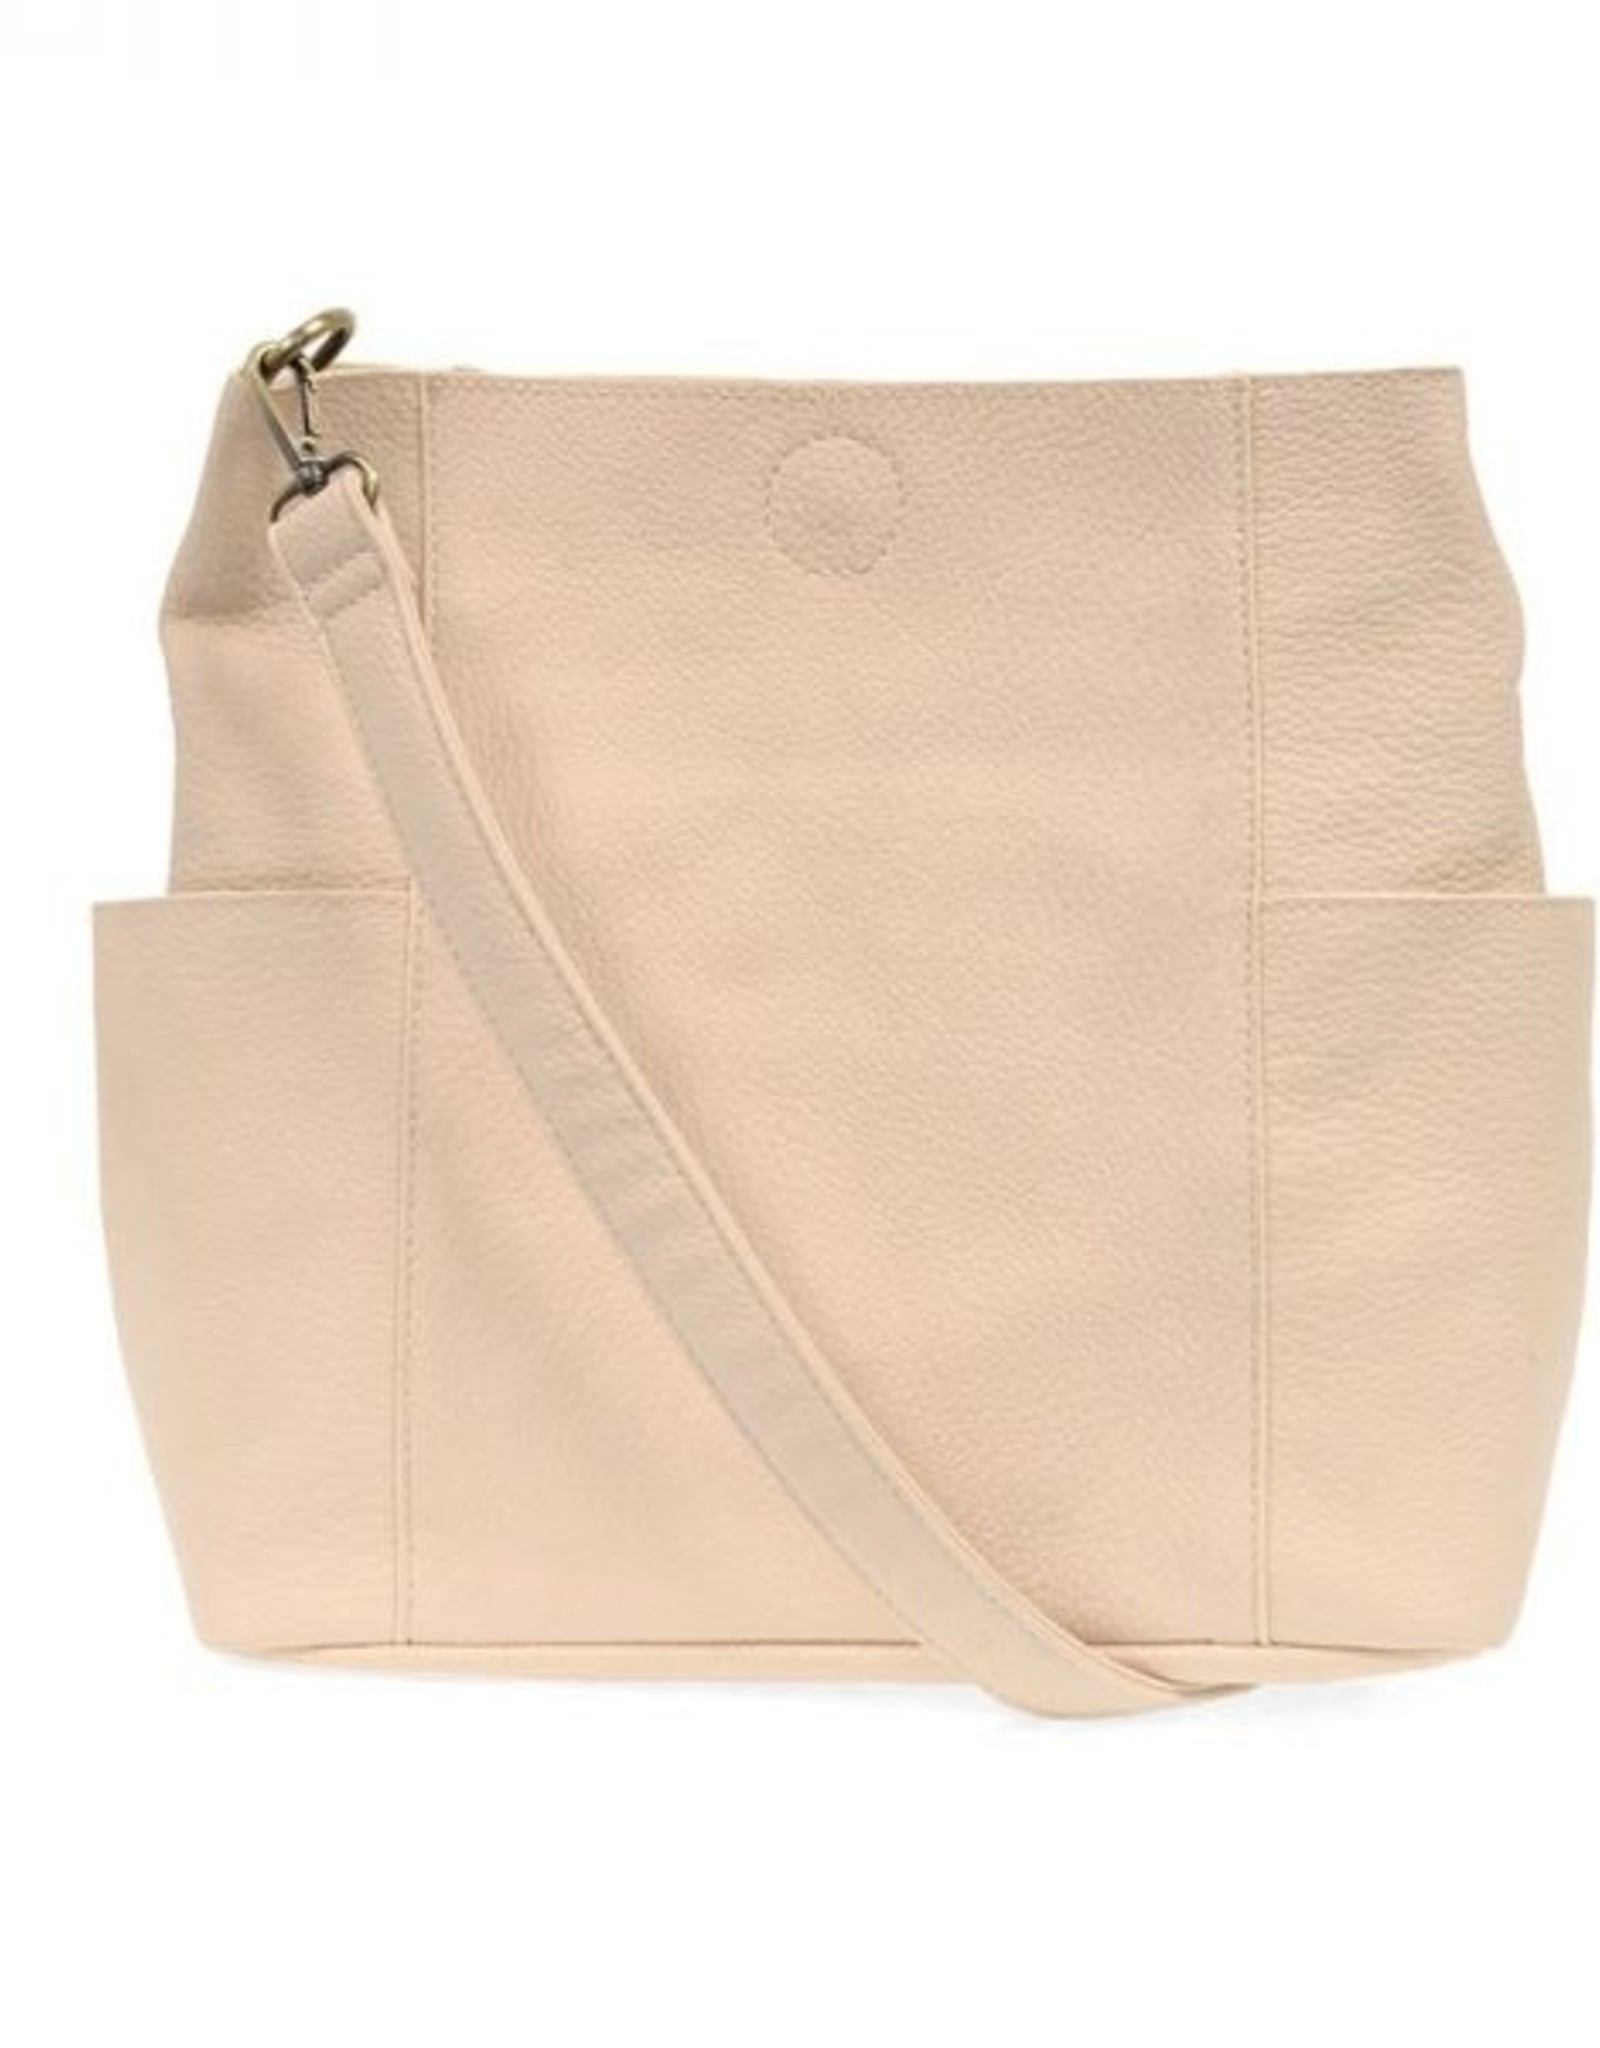 Joy Susan Joy Susan Kayleigh Side Pocket Bucket